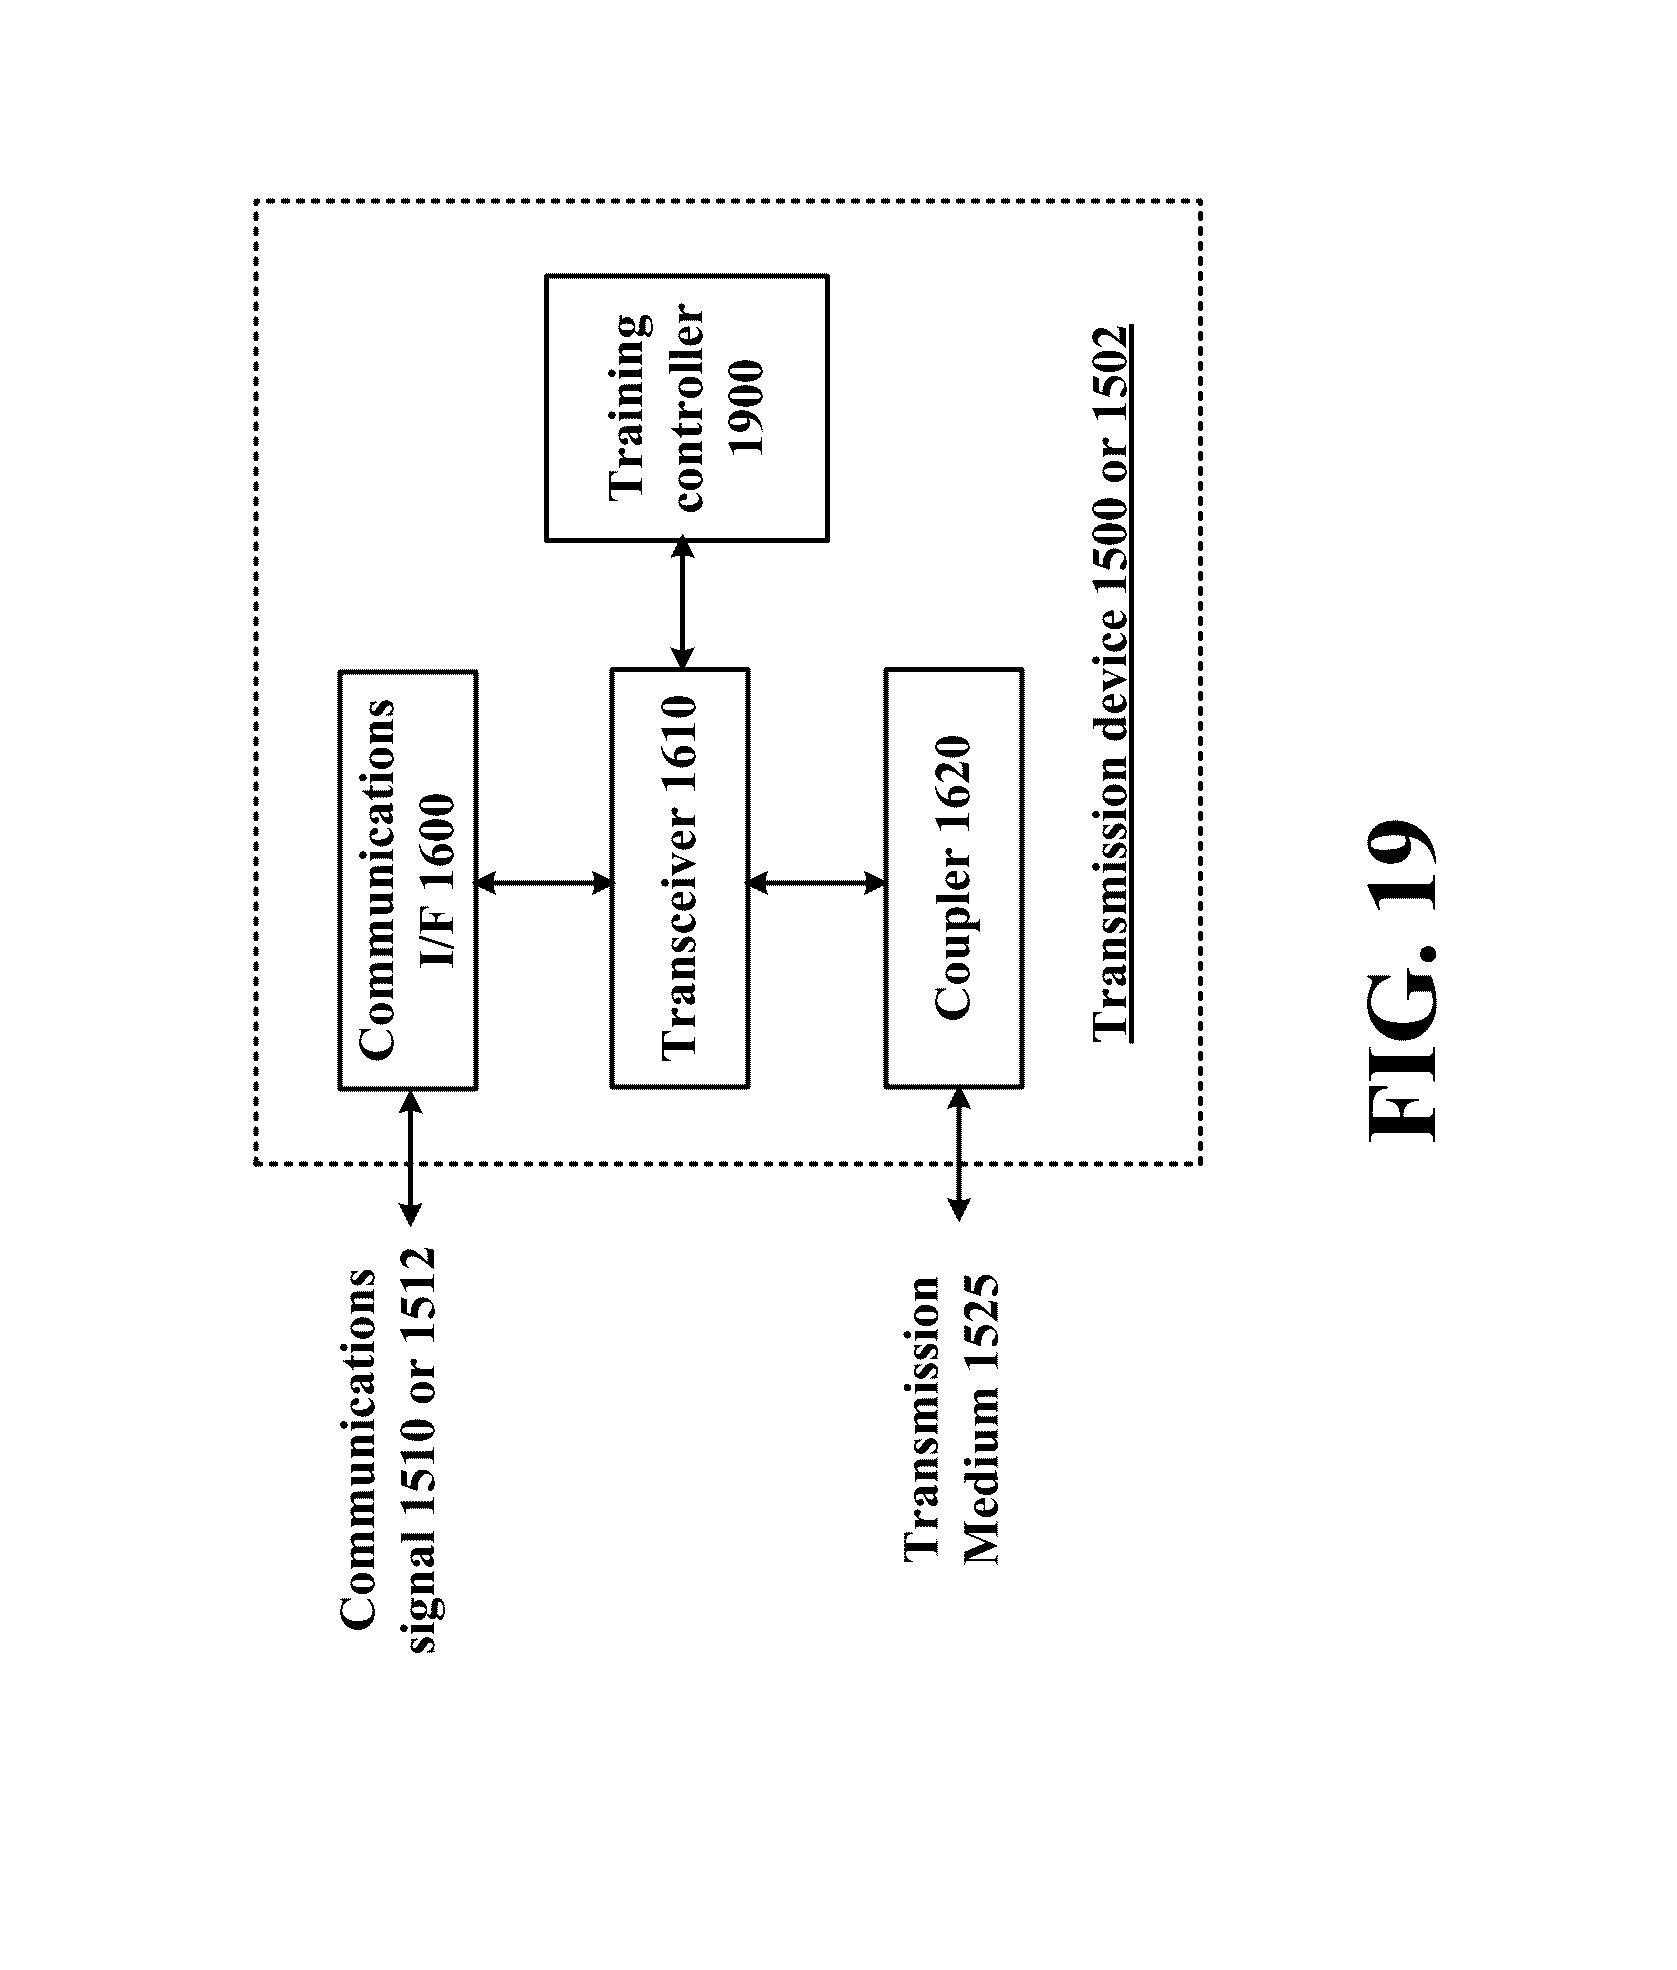 Transmission Interchange Chart